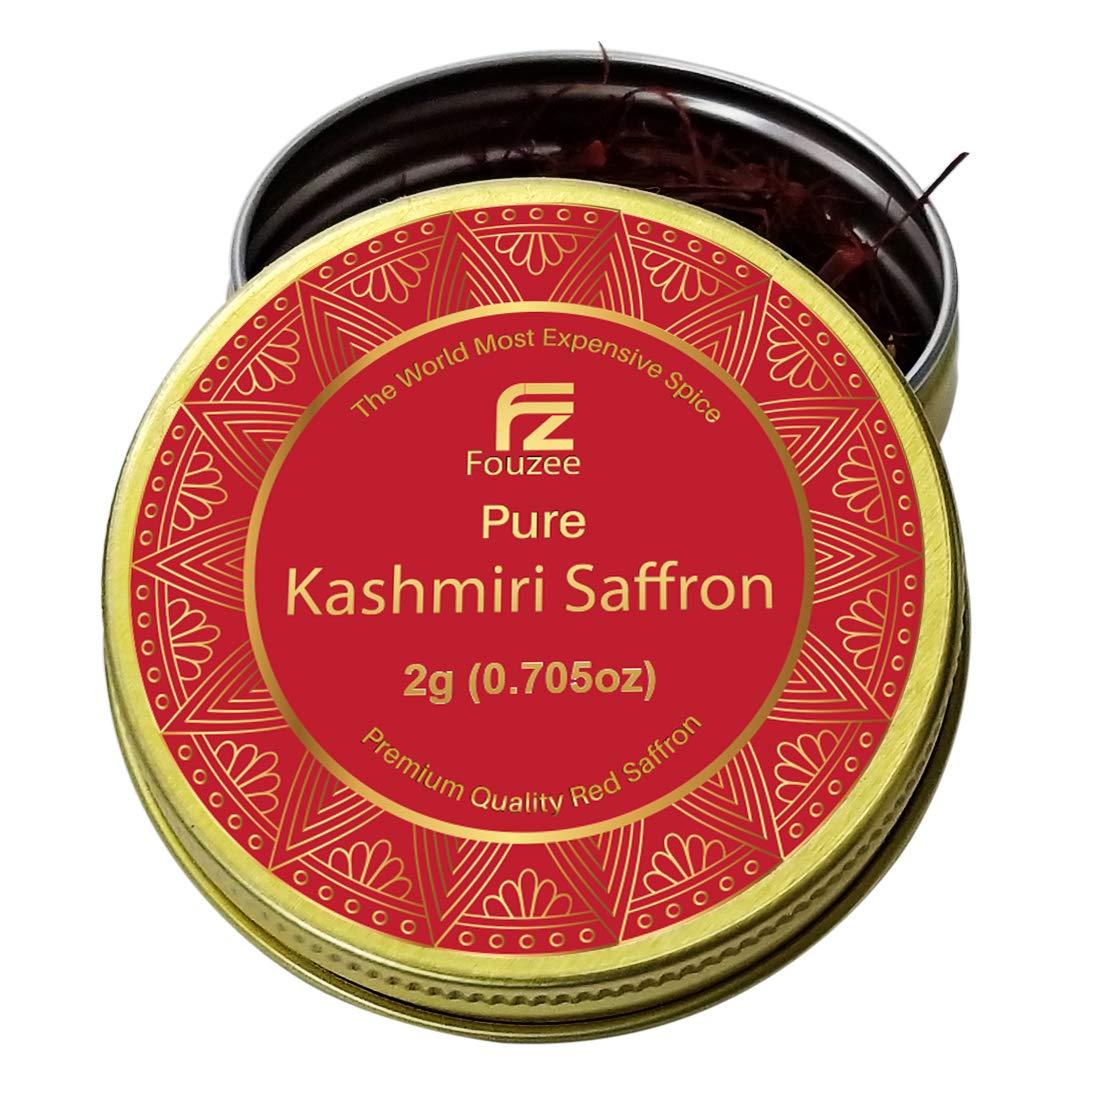 Fouzee Pure Kashmiri Saffron Threads 0.0705oz 2g – Finest 100% All-Red Saffron Spice For Cooking, Paella Rice, Golden Milk, Persian Rice, Tea